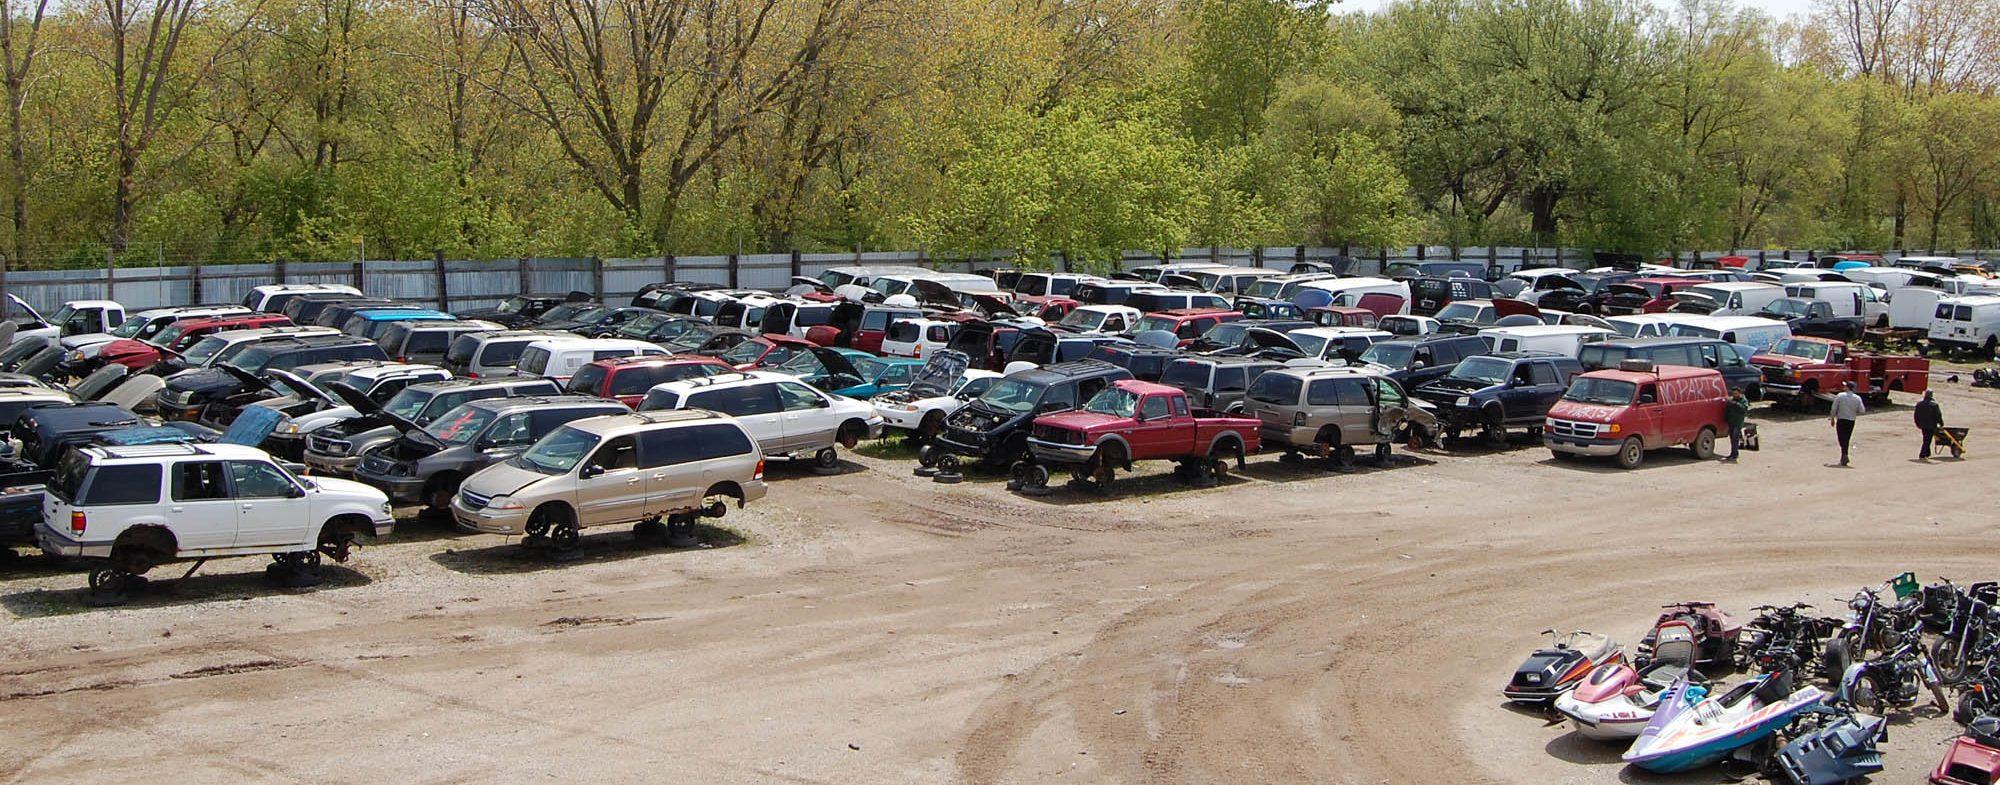 selling car to a junkyard